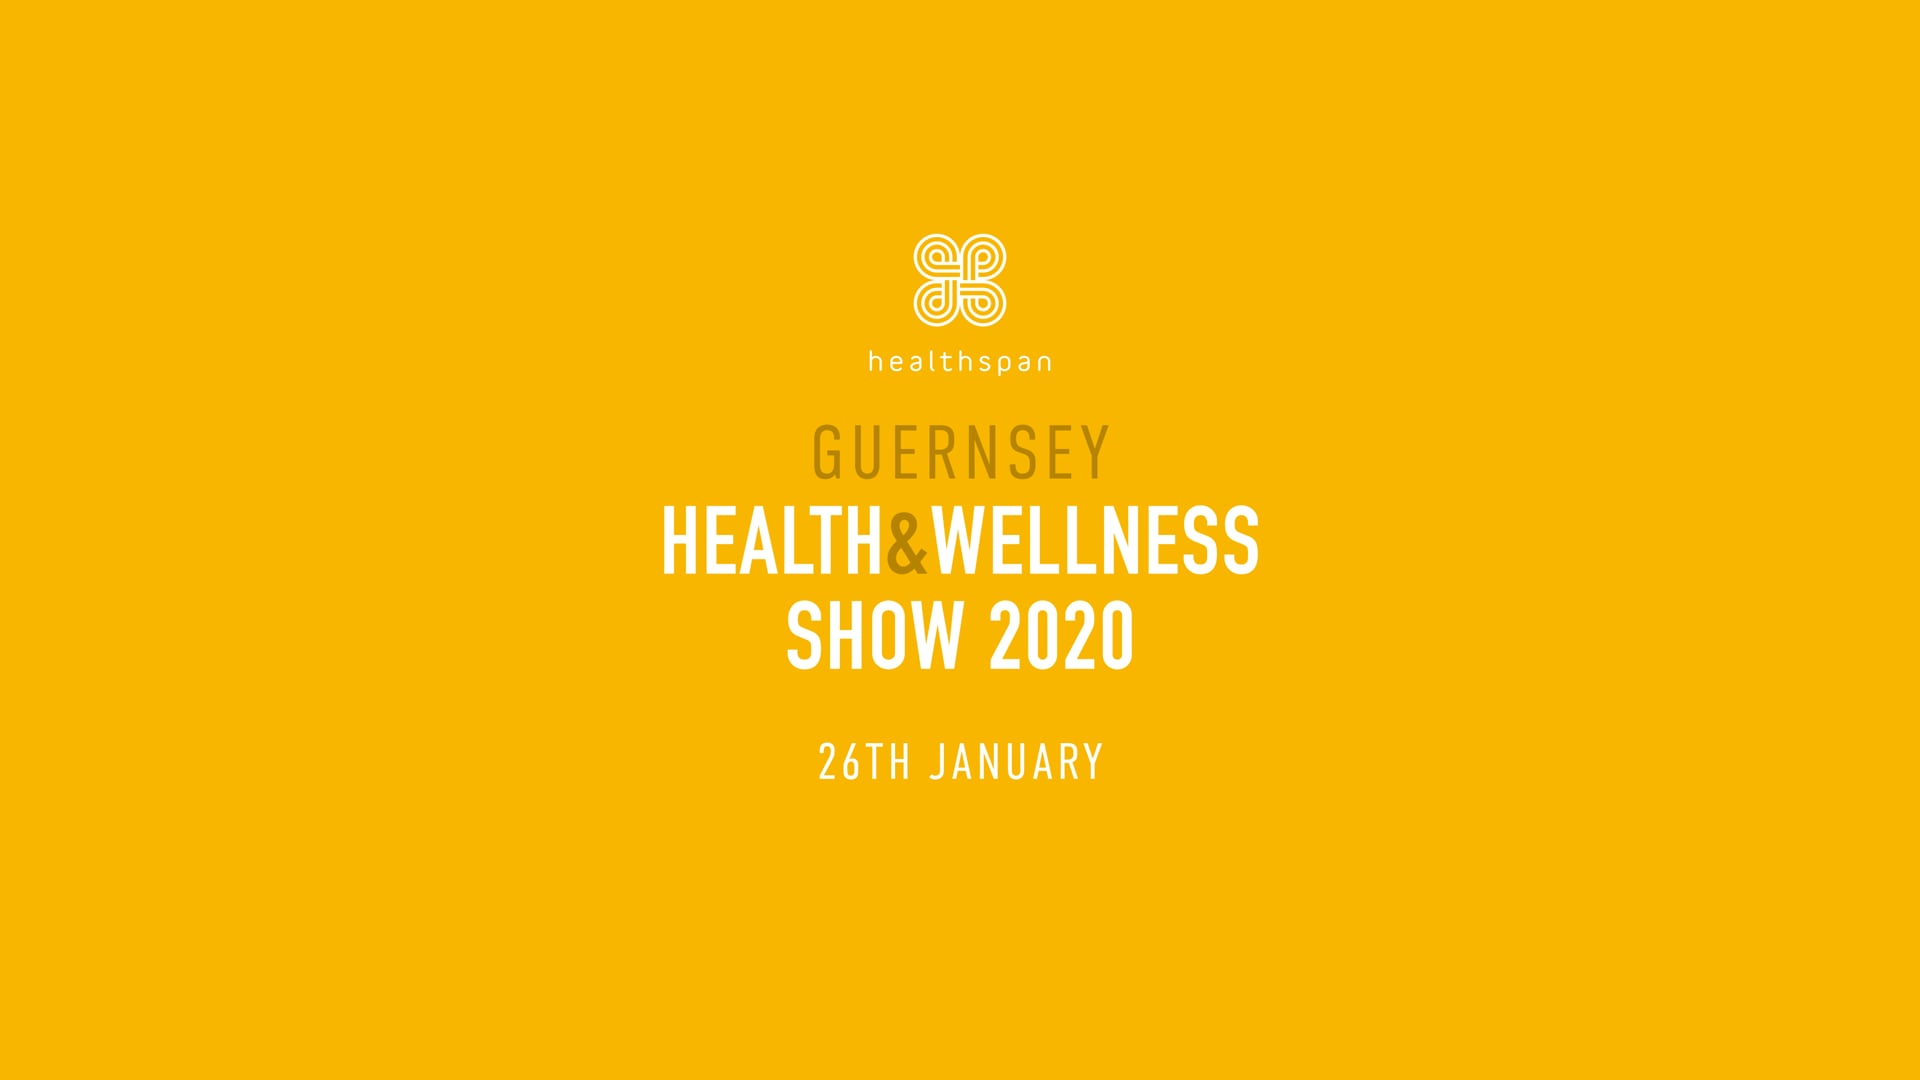 Health & Wellness Show 2020